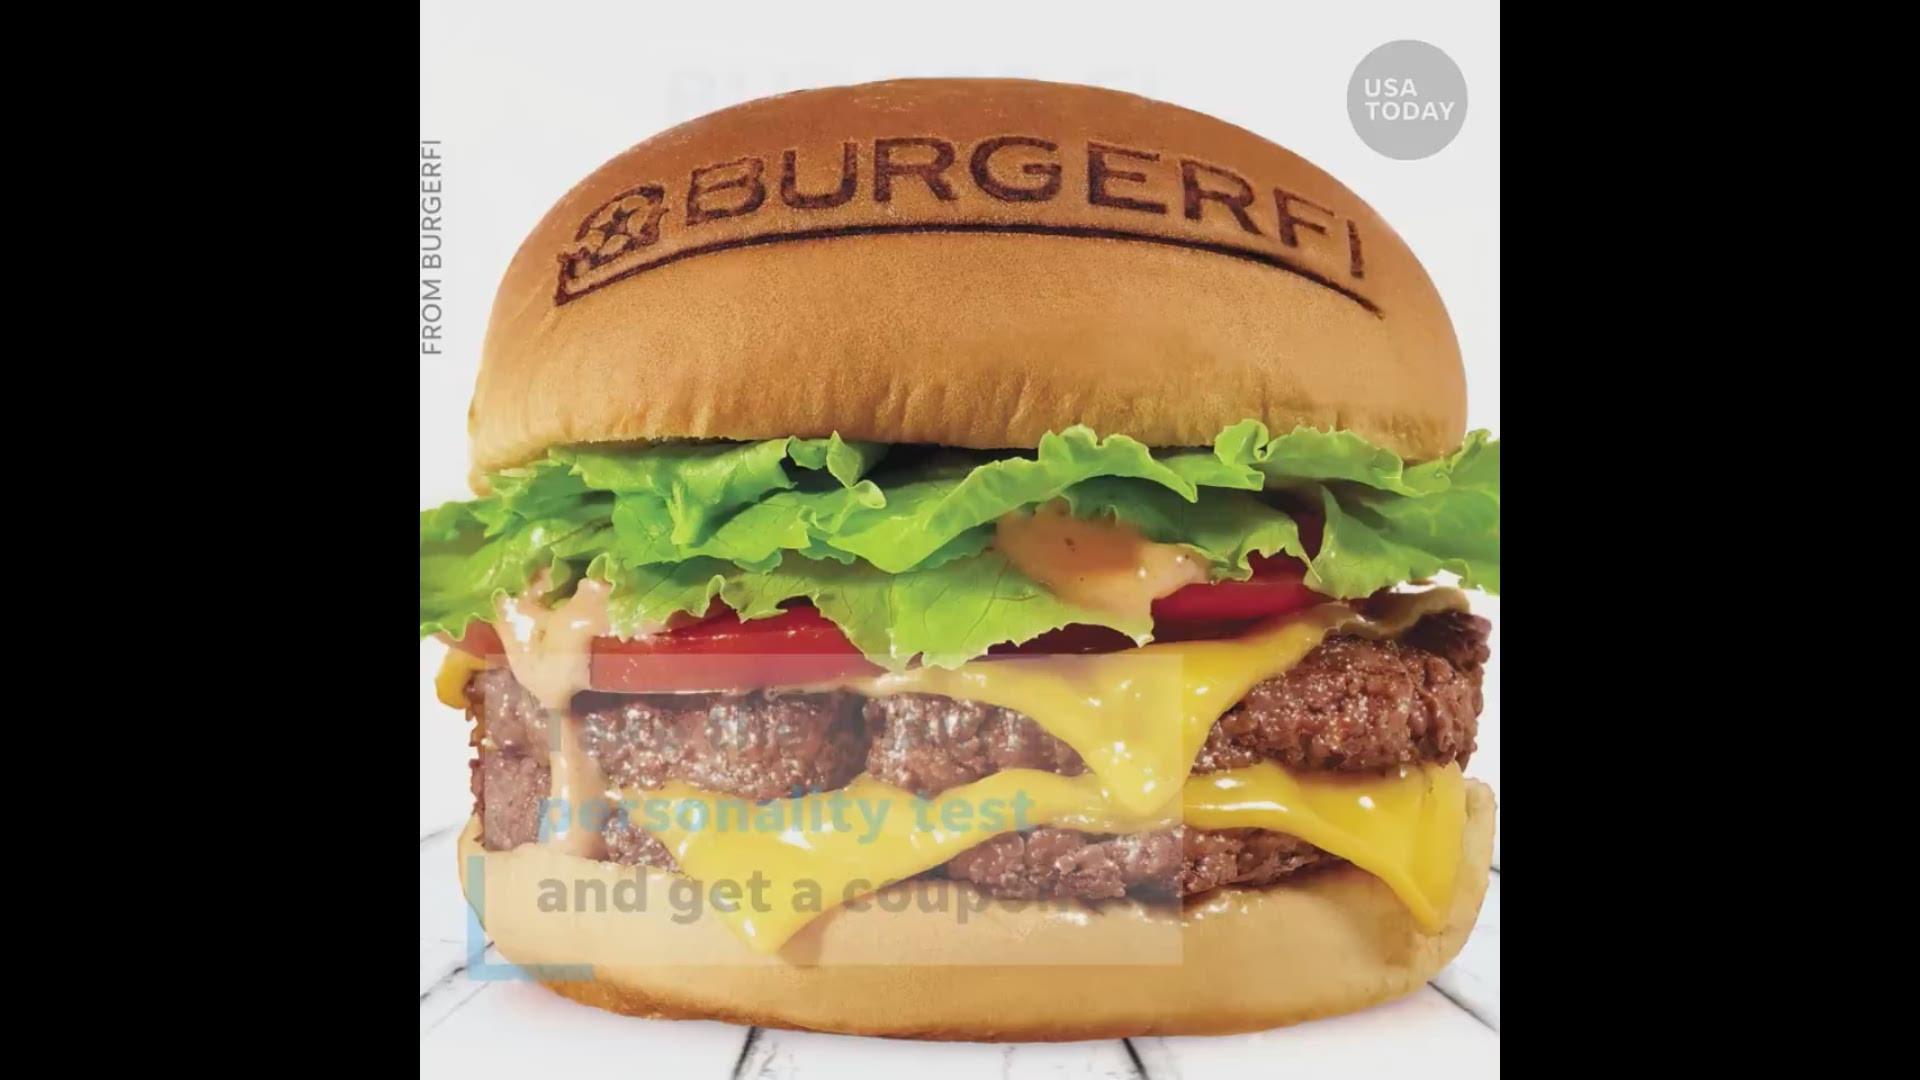 Beefy deals for National Hamburger Day wwltvcom 1920x1080